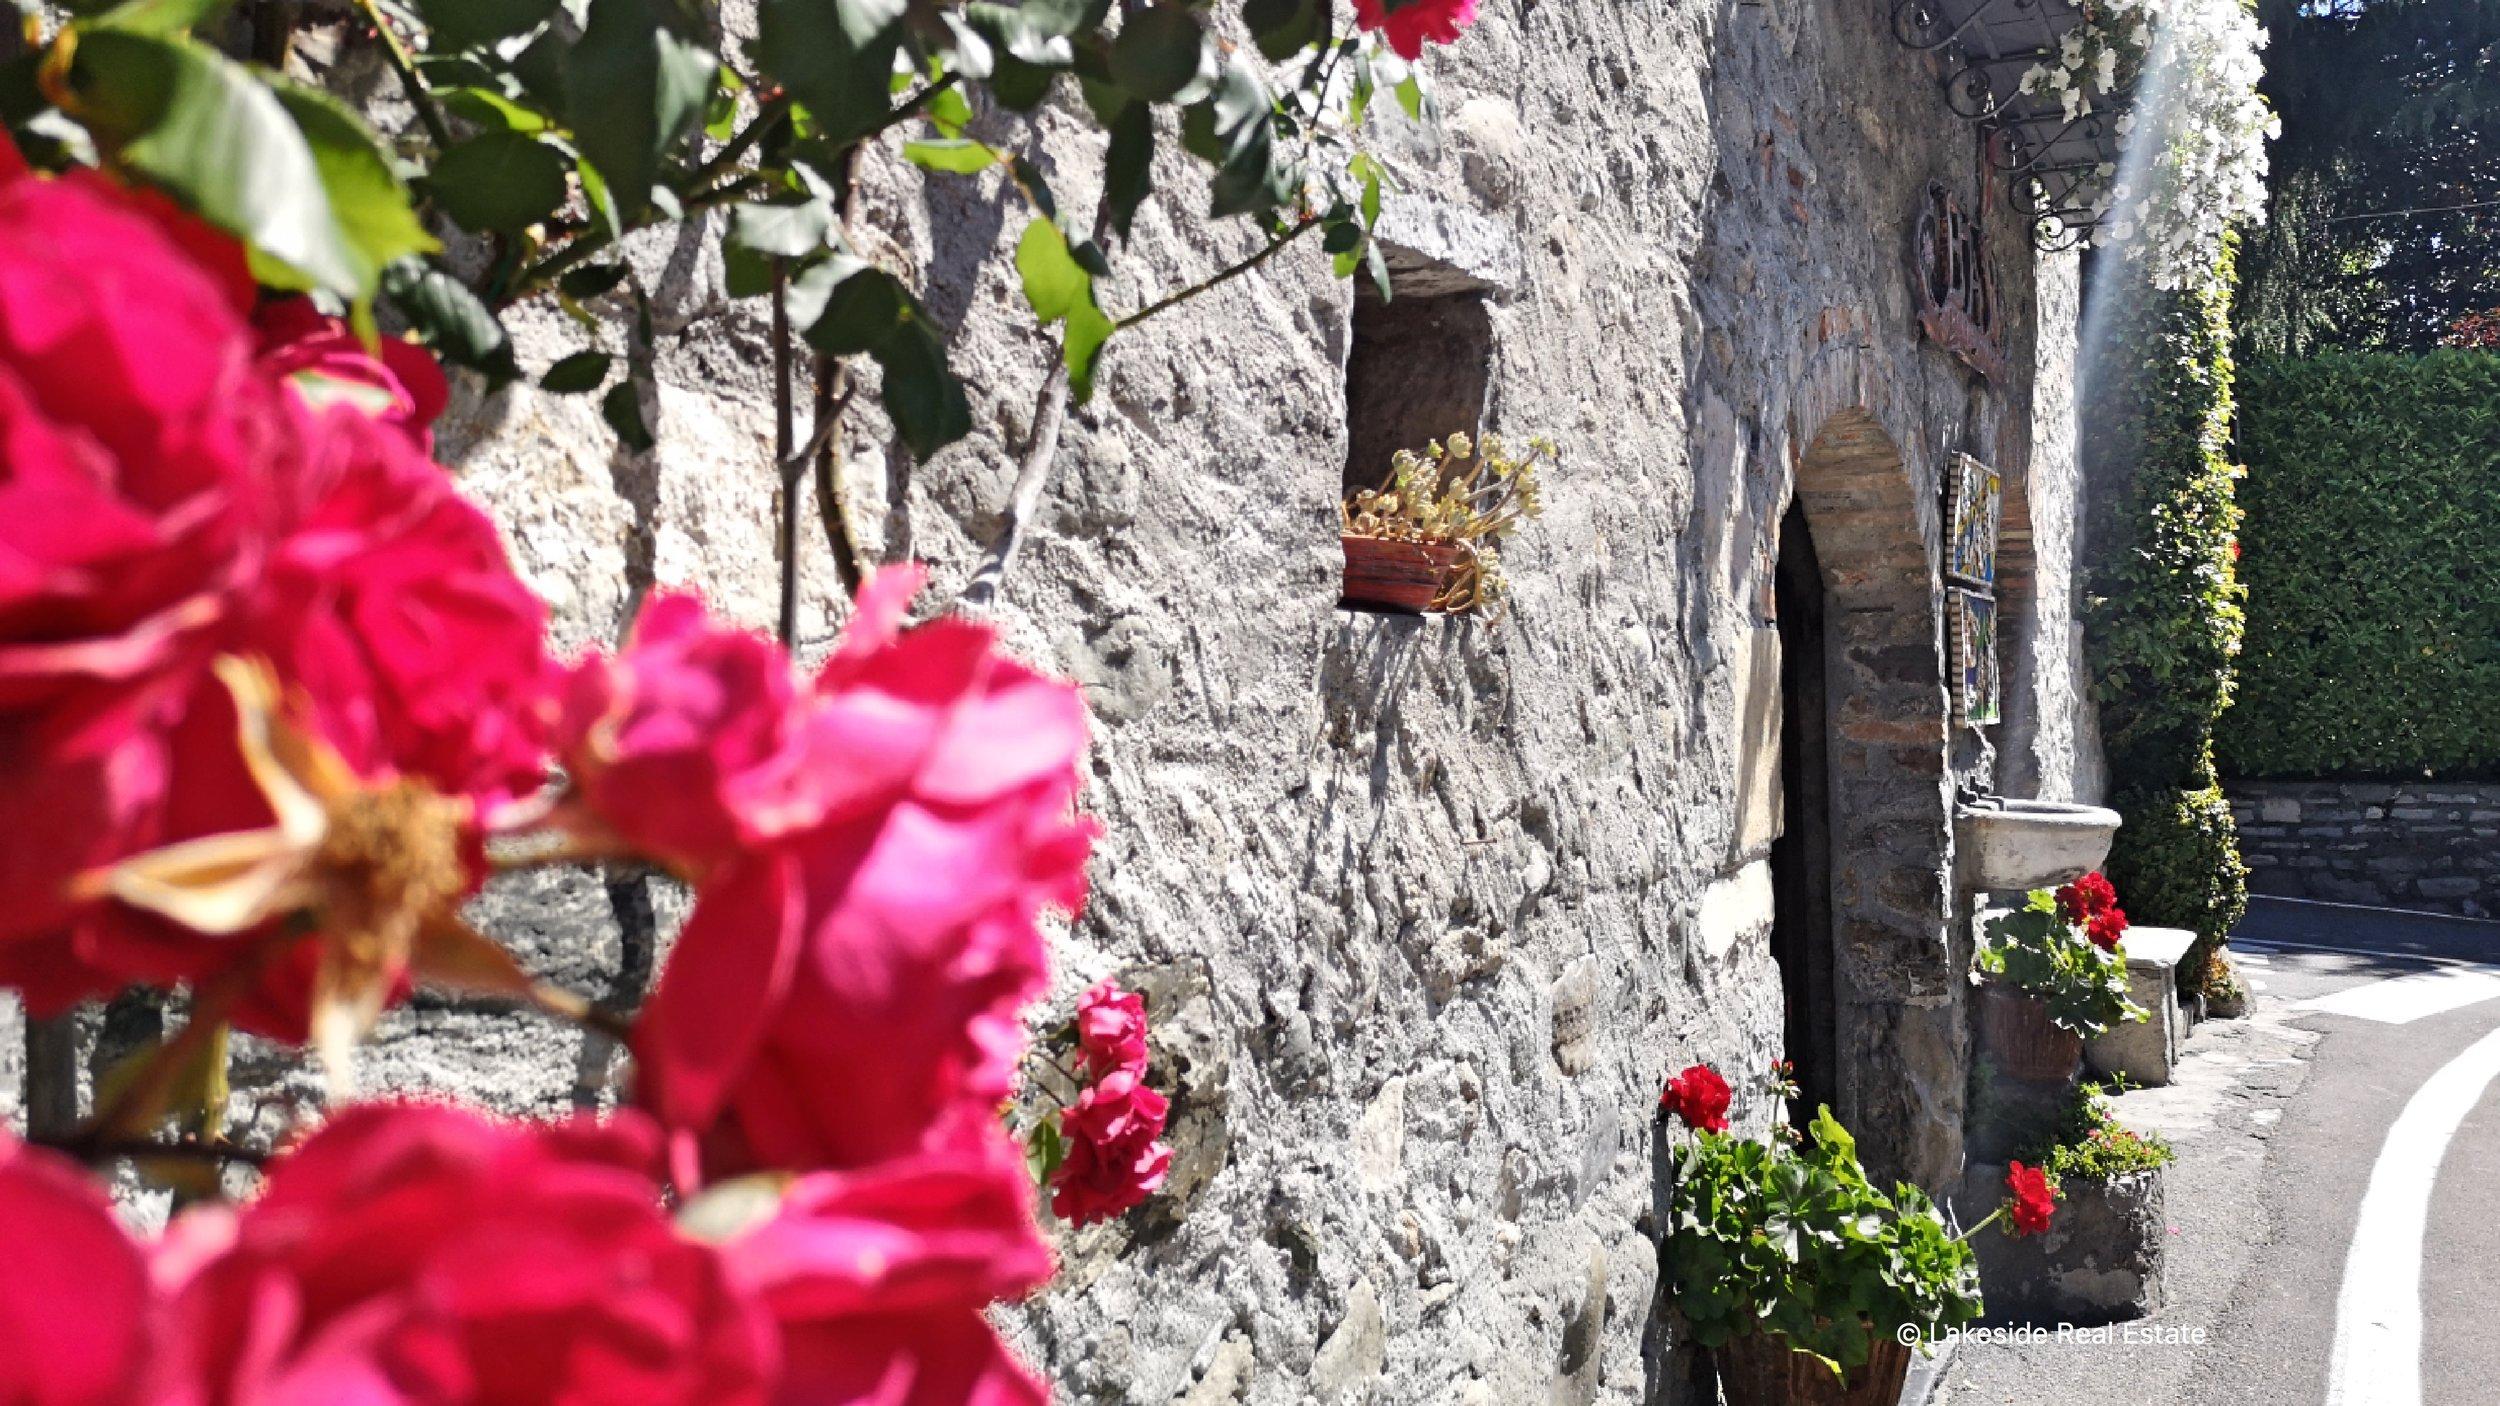 The charming rustic facade of Vecchia Torre pub in Griante